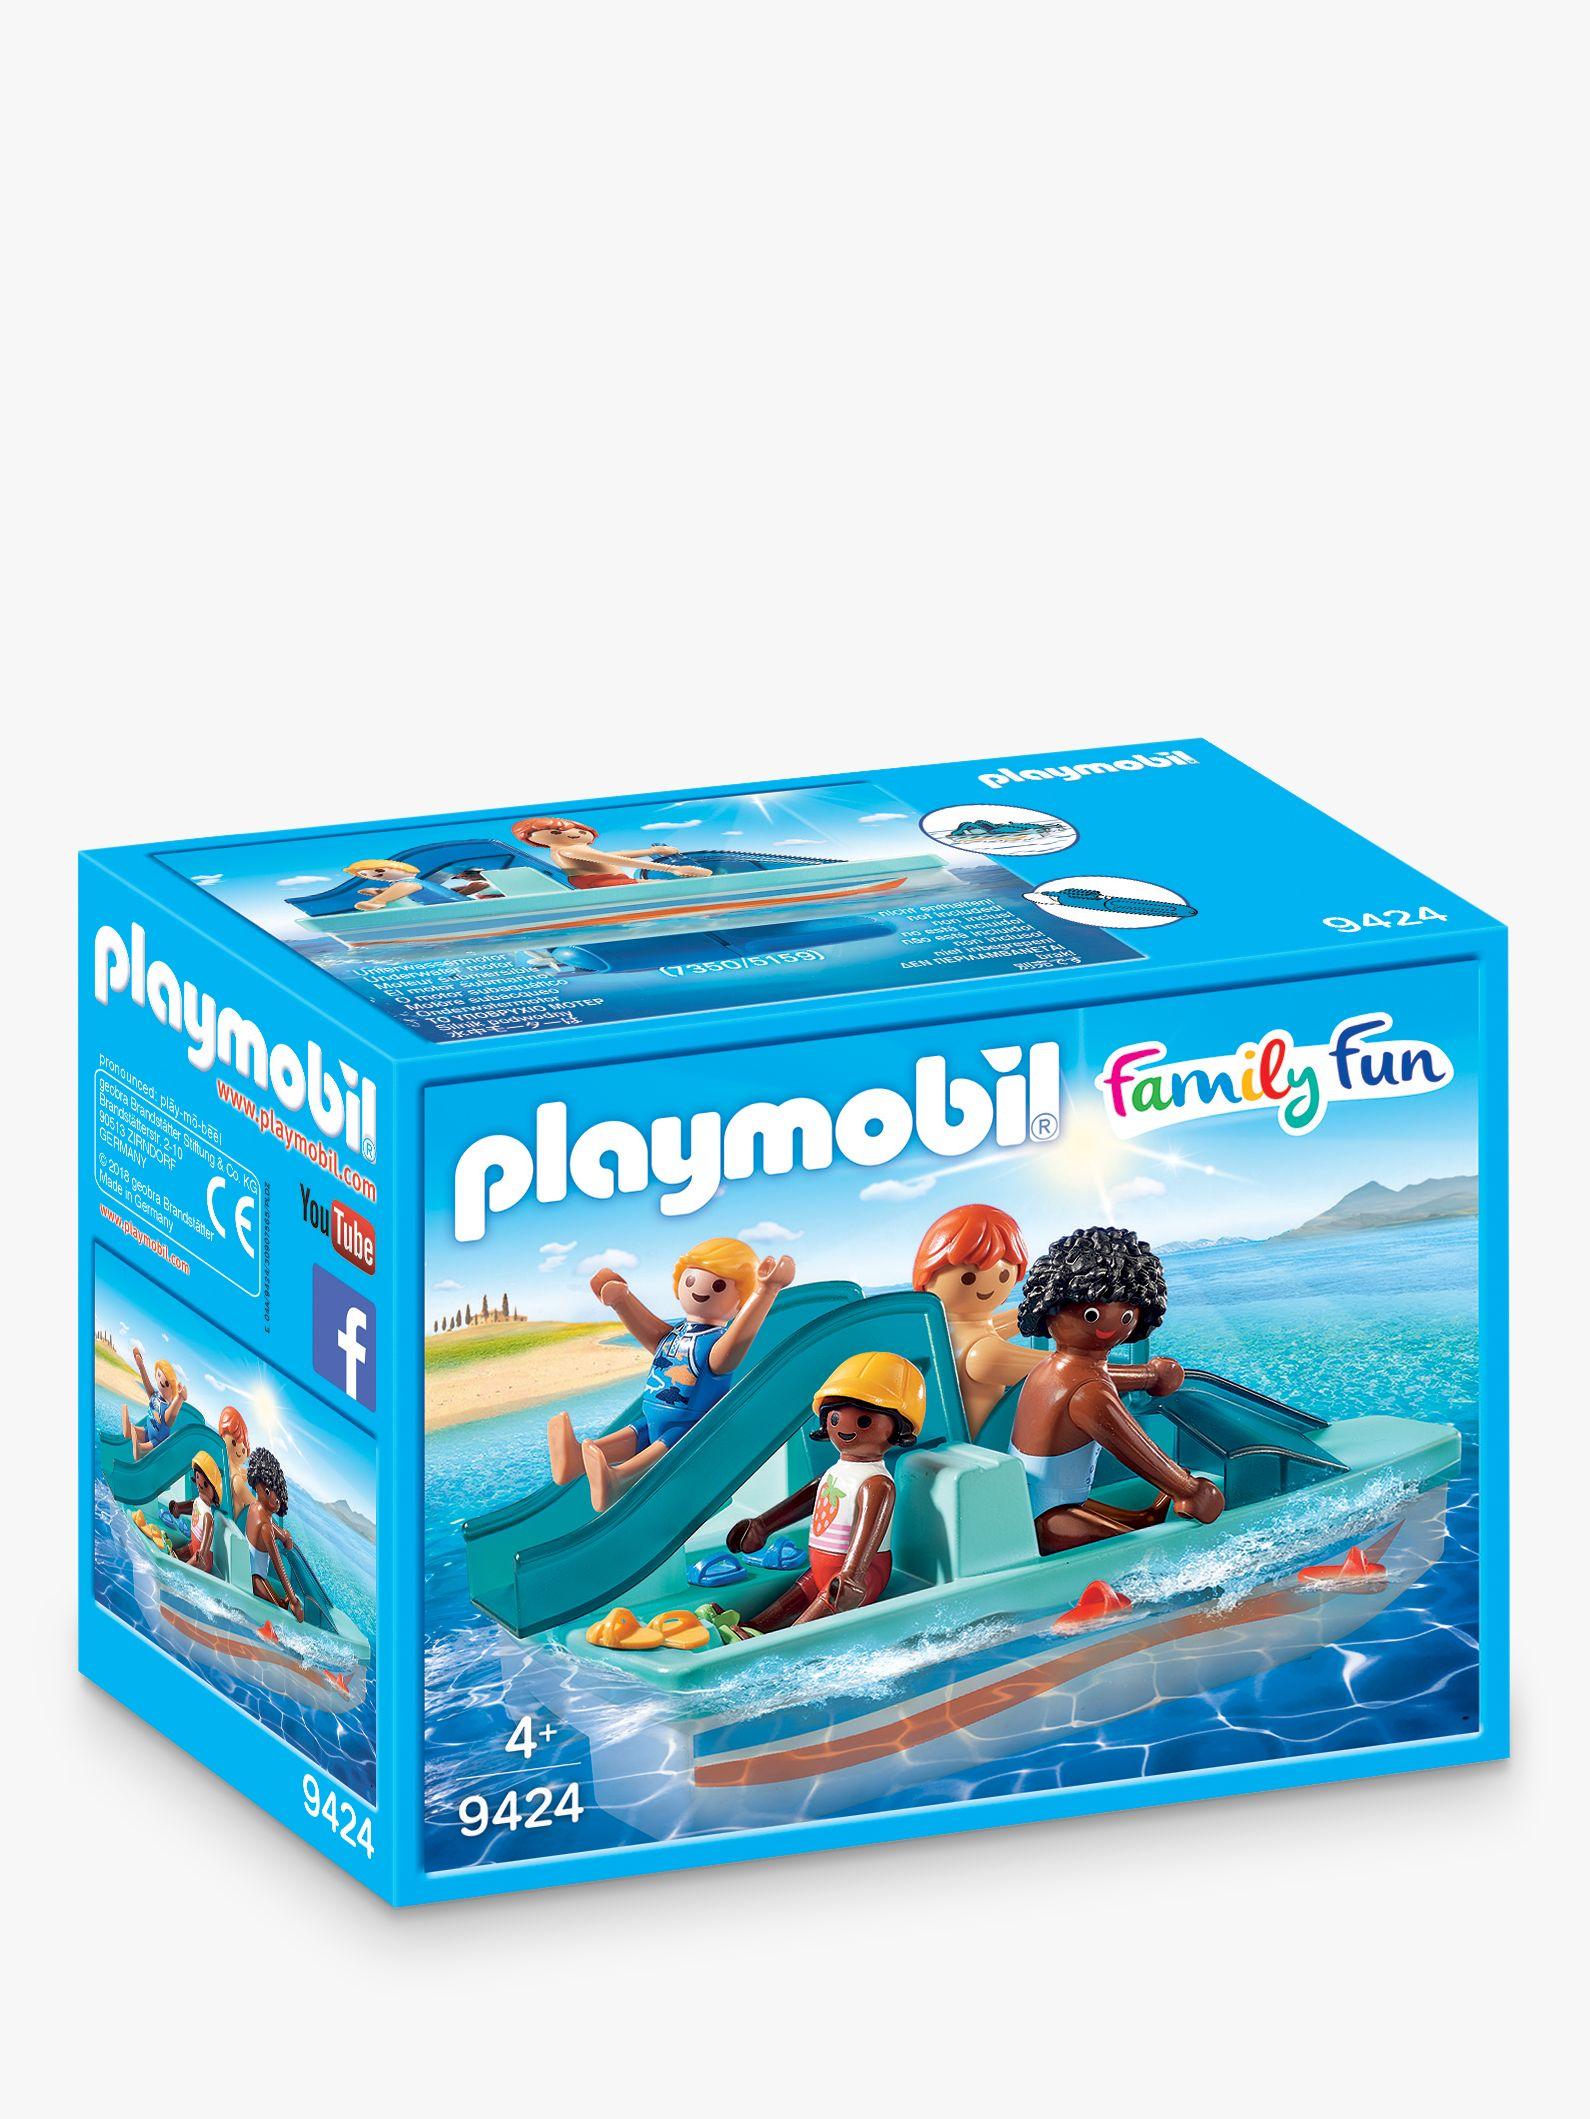 PLAYMOBIL Playmobil Family Fun 9424 Floating Paddle Boat